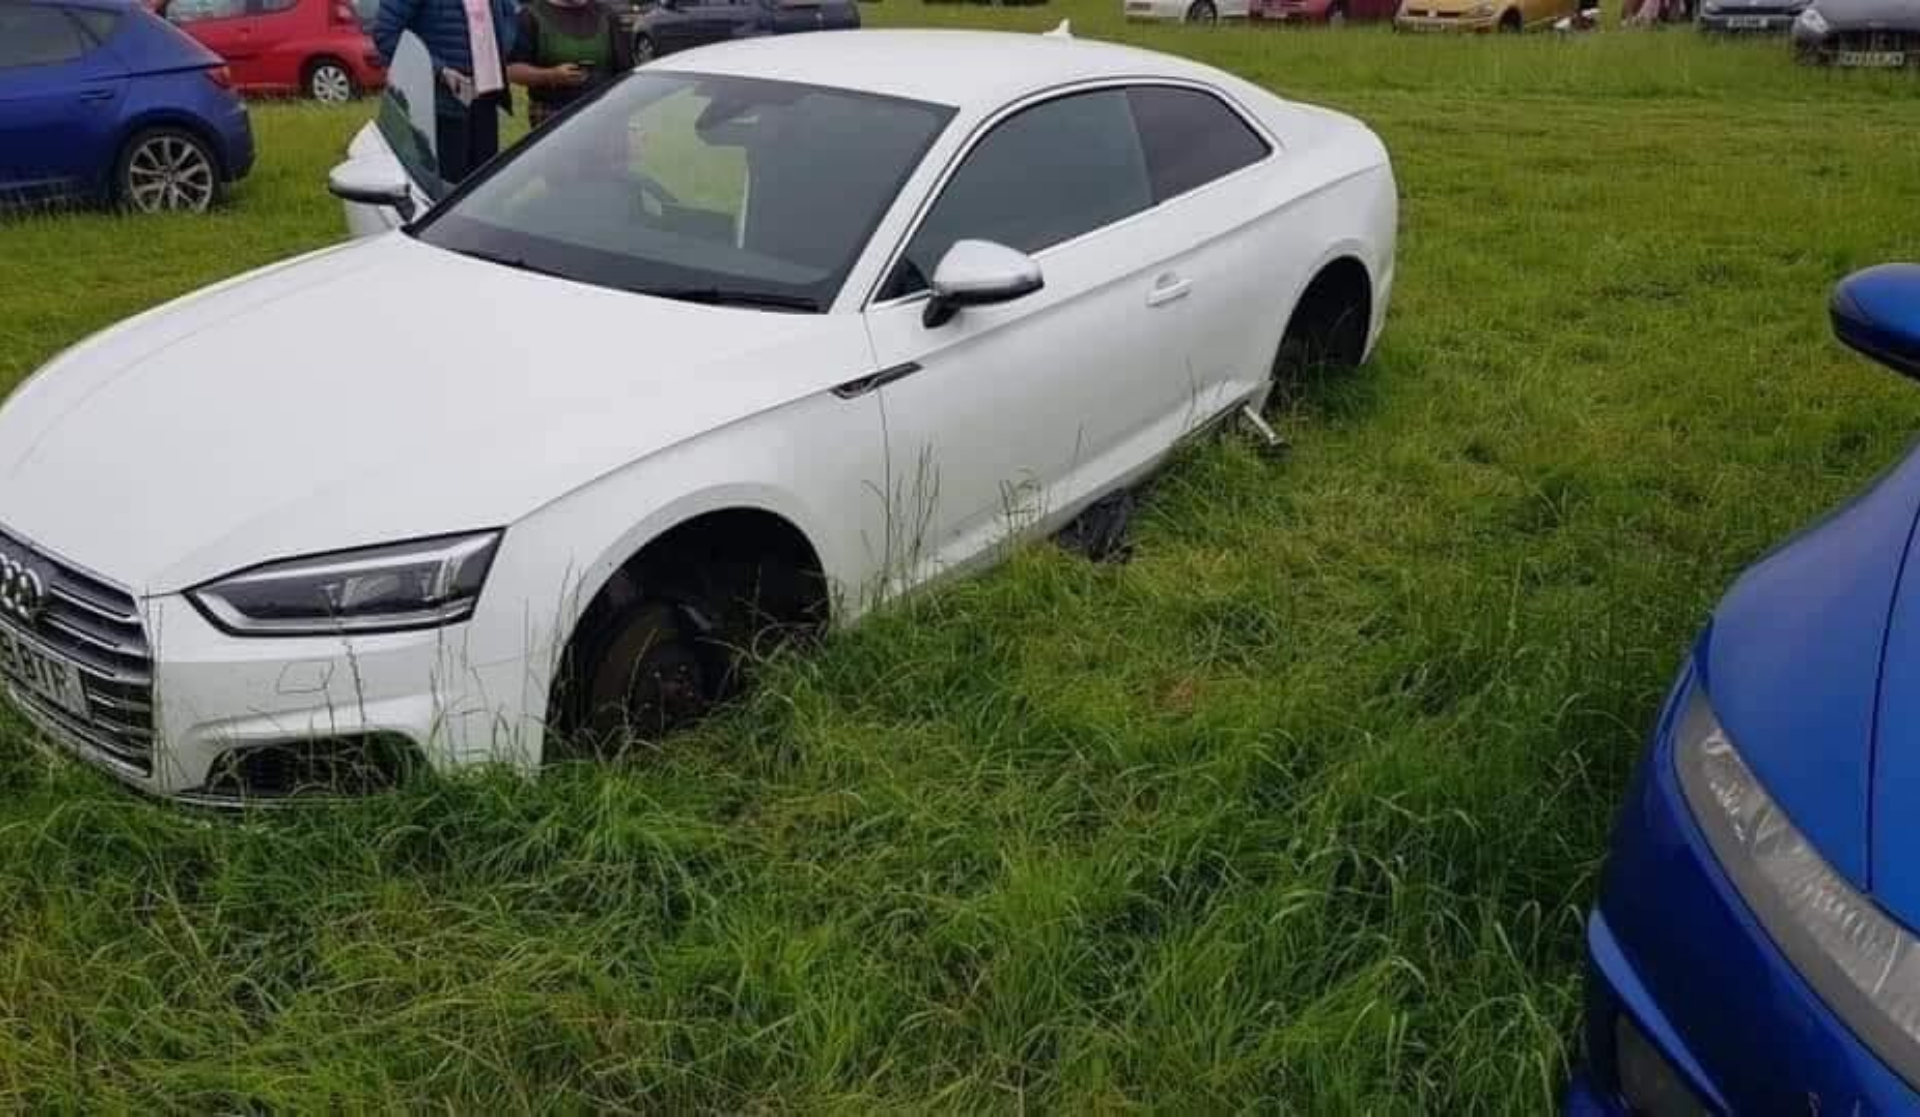 Cars stripped in Creamfields festival parking